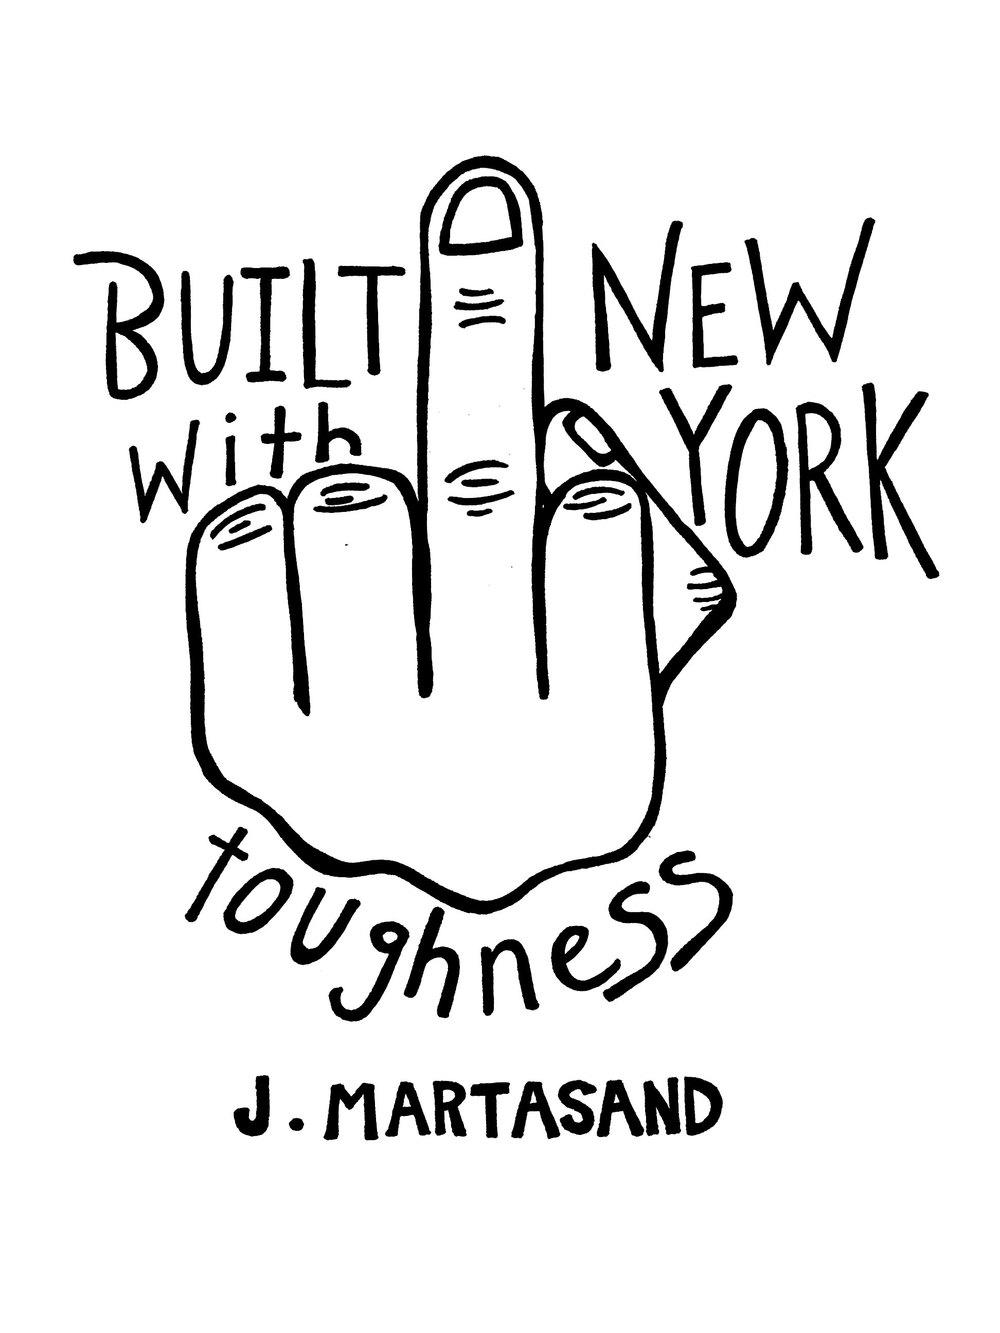 J MARTASAND